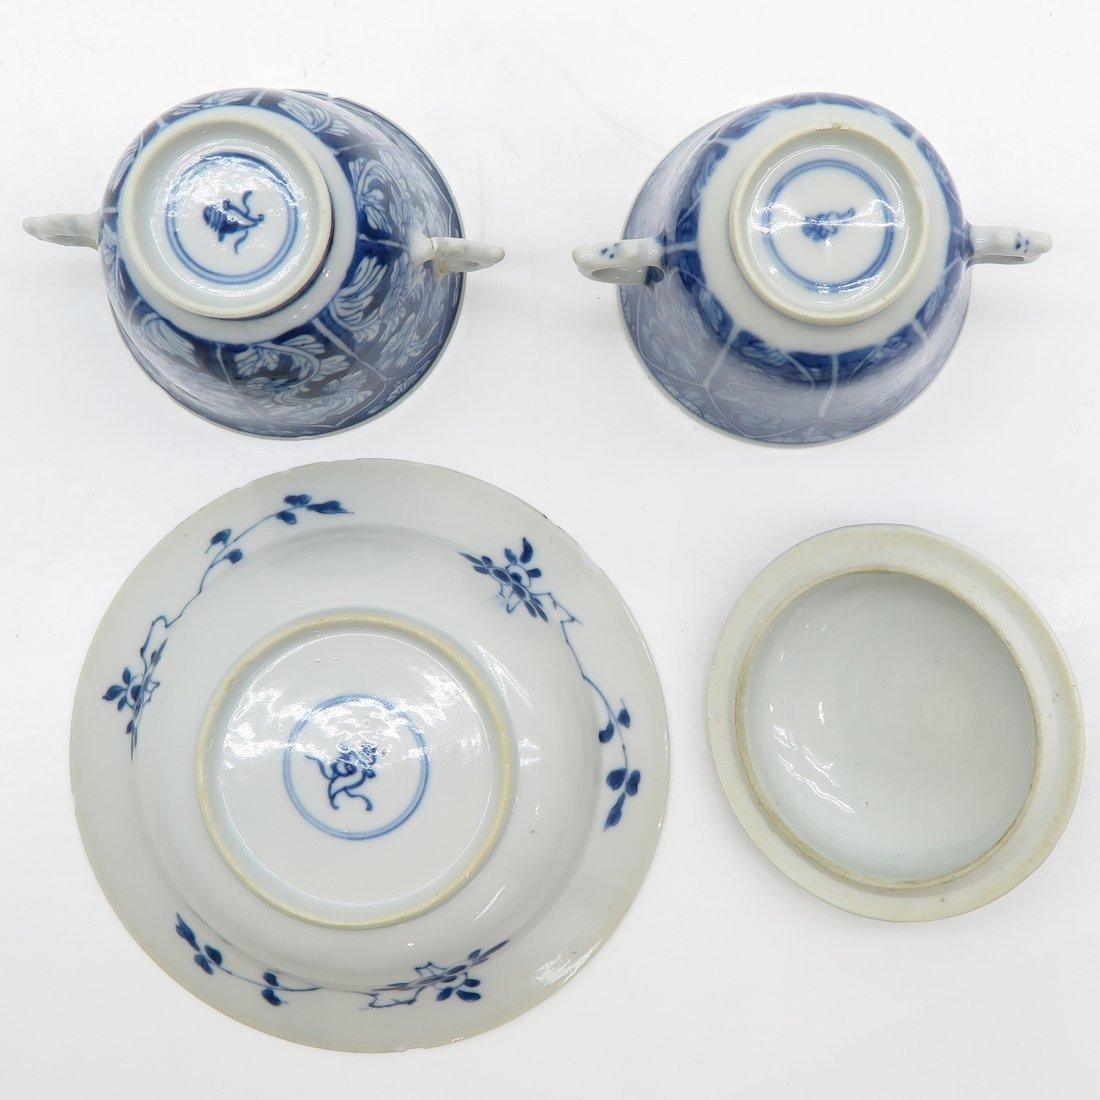 Lot of China Porcelain - 3